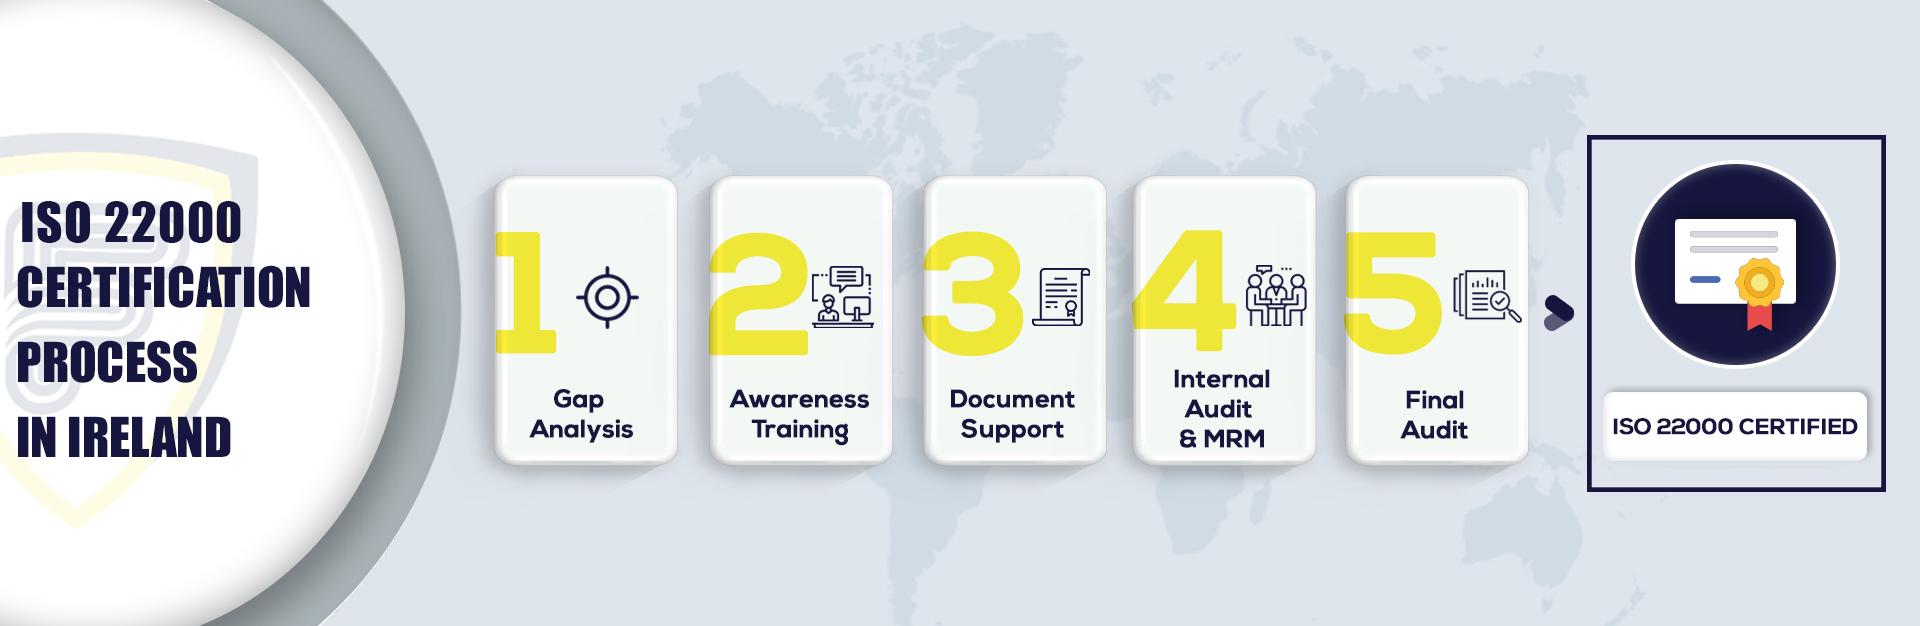 ISO 22000 Certification in Ireland